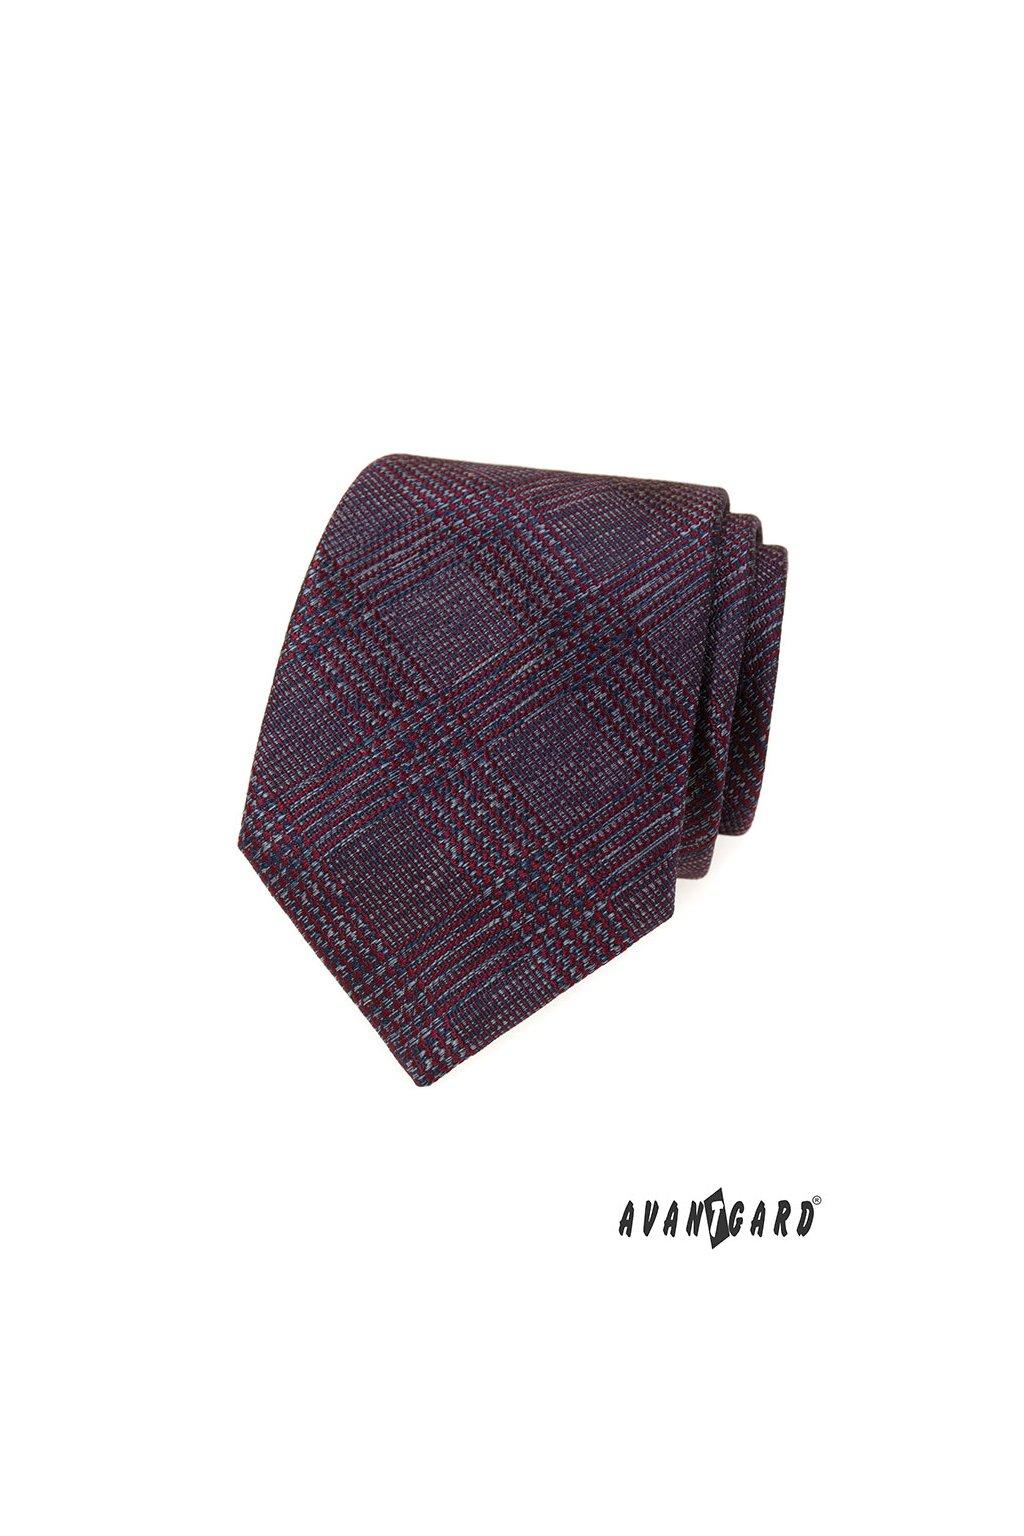 Pánská luxusní kravata bordó 561 - 62311